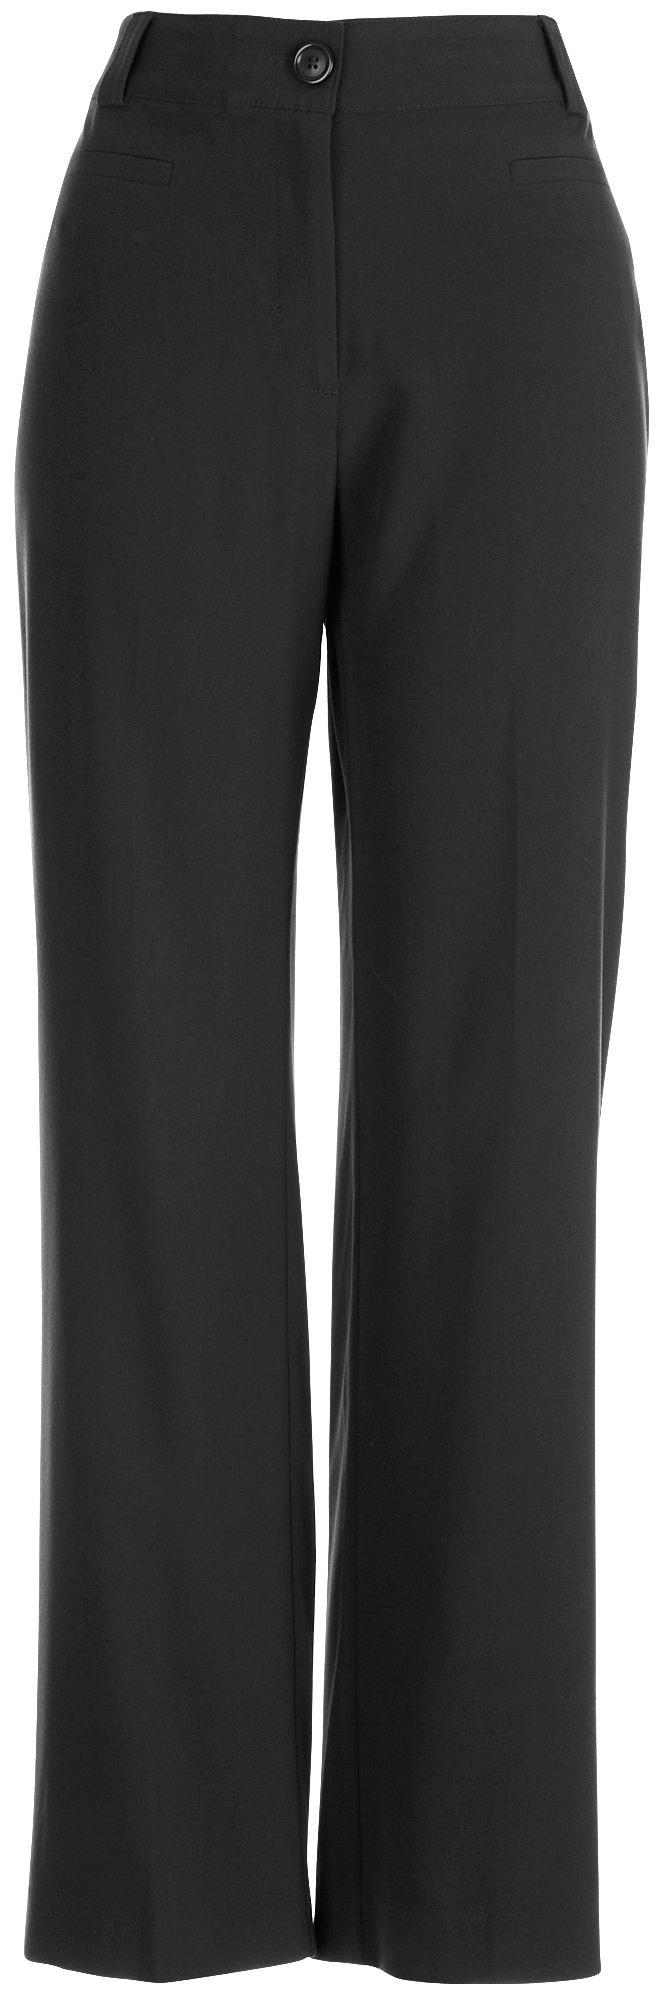 Counterparts Petite Bi-Stretch No Gap Pants 12P Black